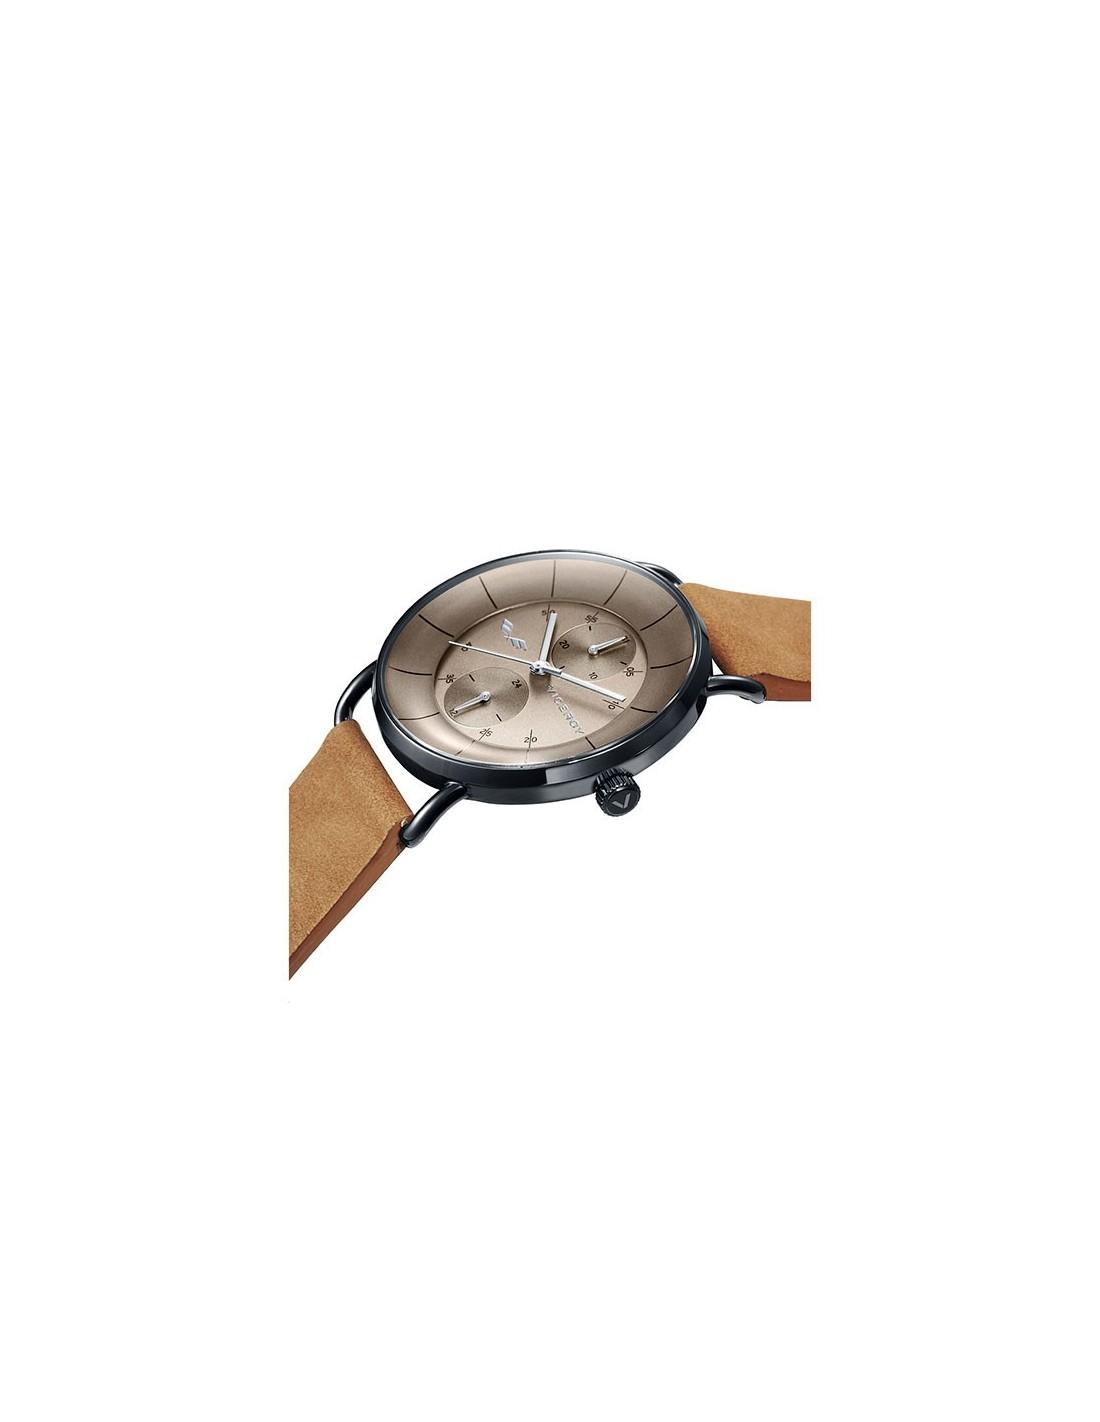 ff0a748629b8 ... Reloj 42367-16 Viceroy ...